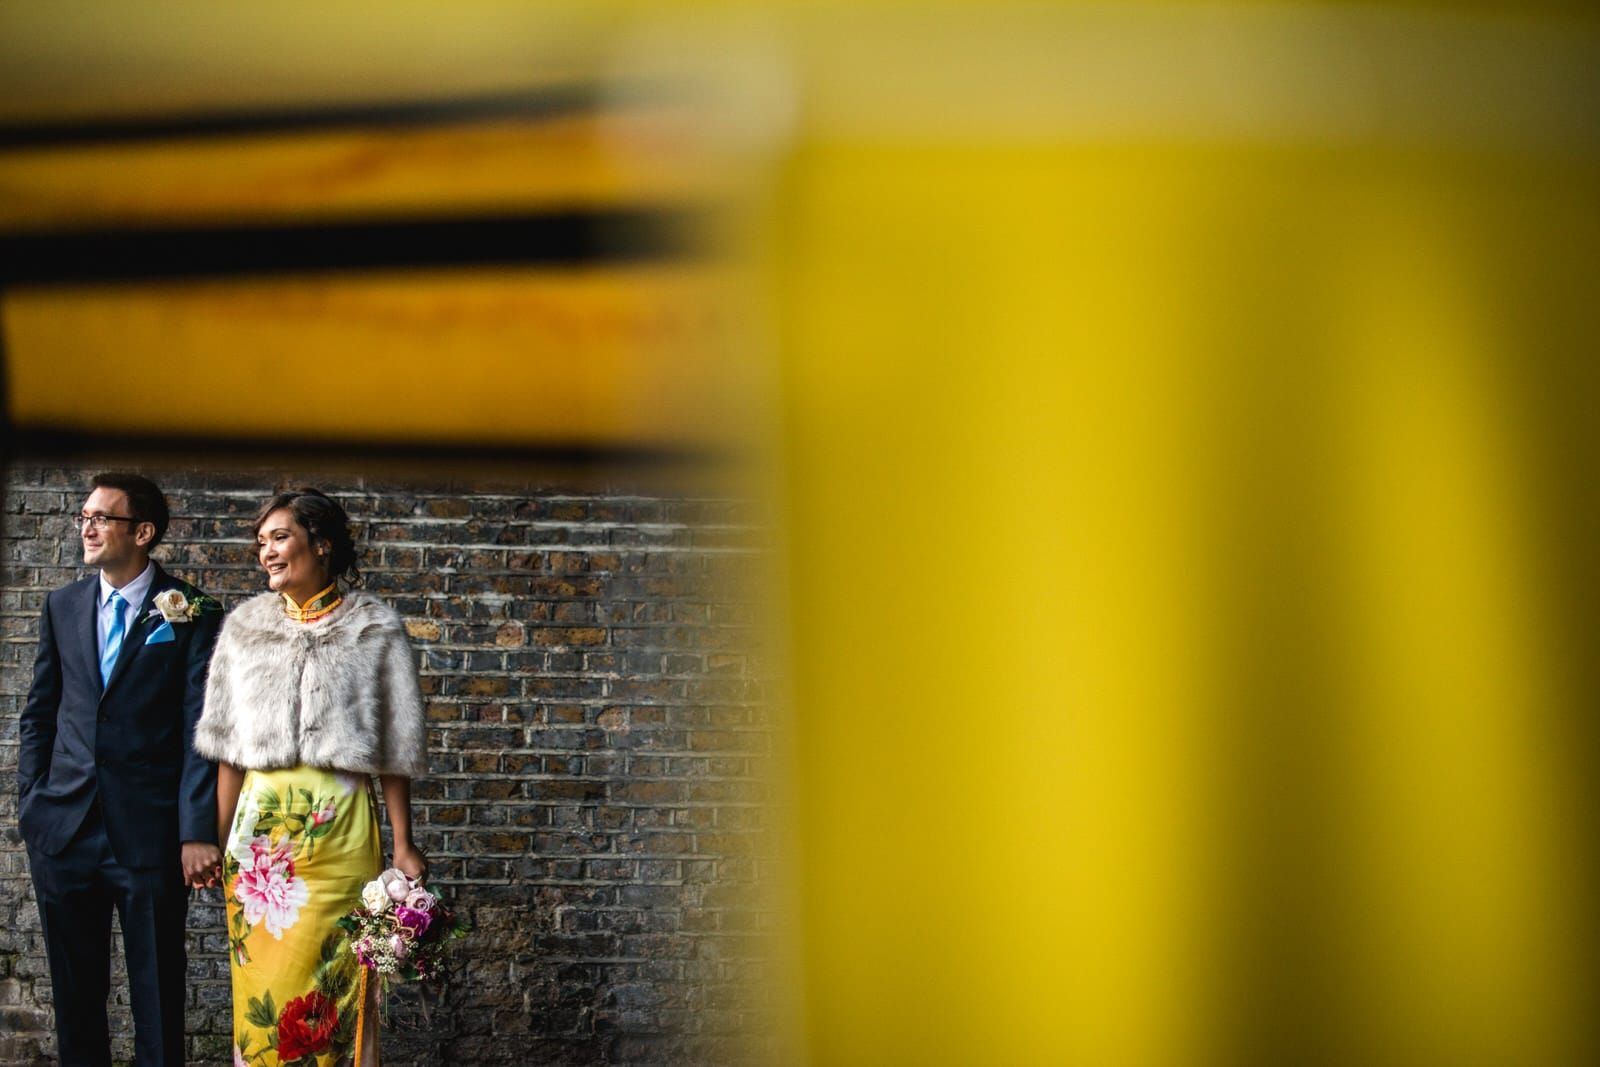 bride and groom through yellow tuk tuk